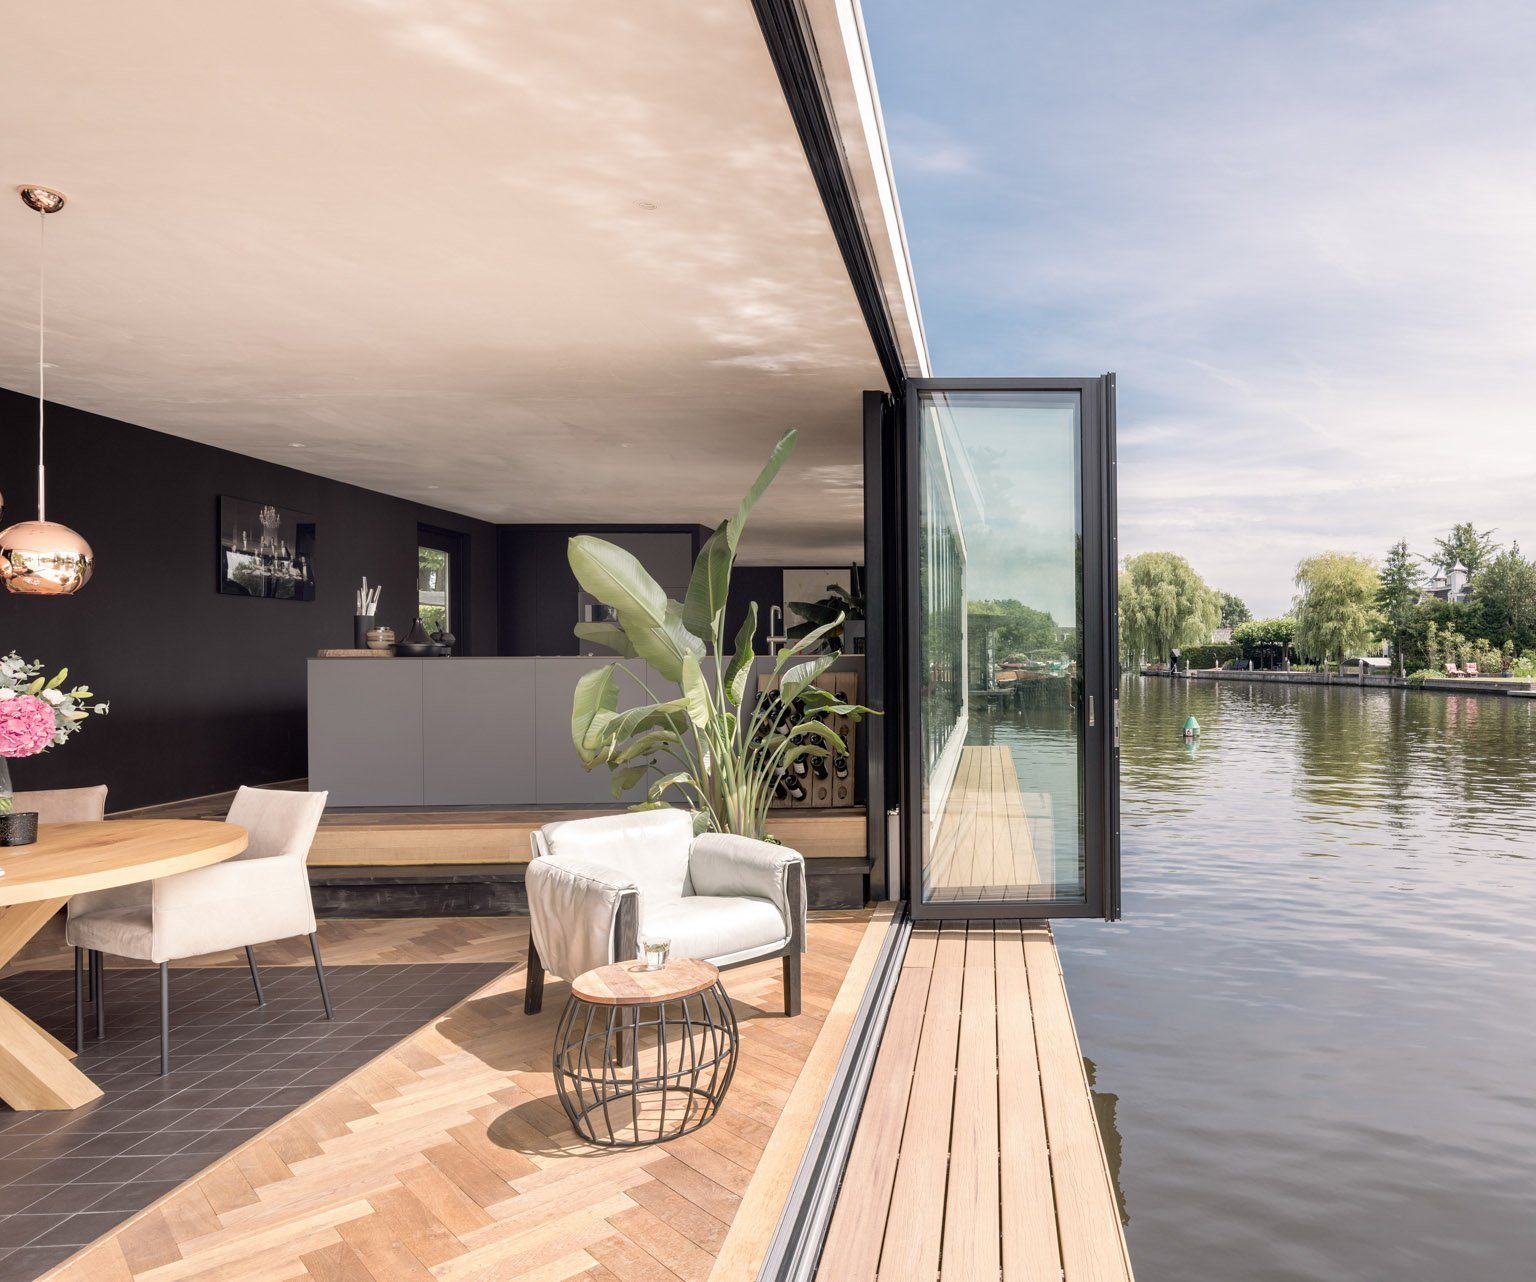 bifolding doors by a lake